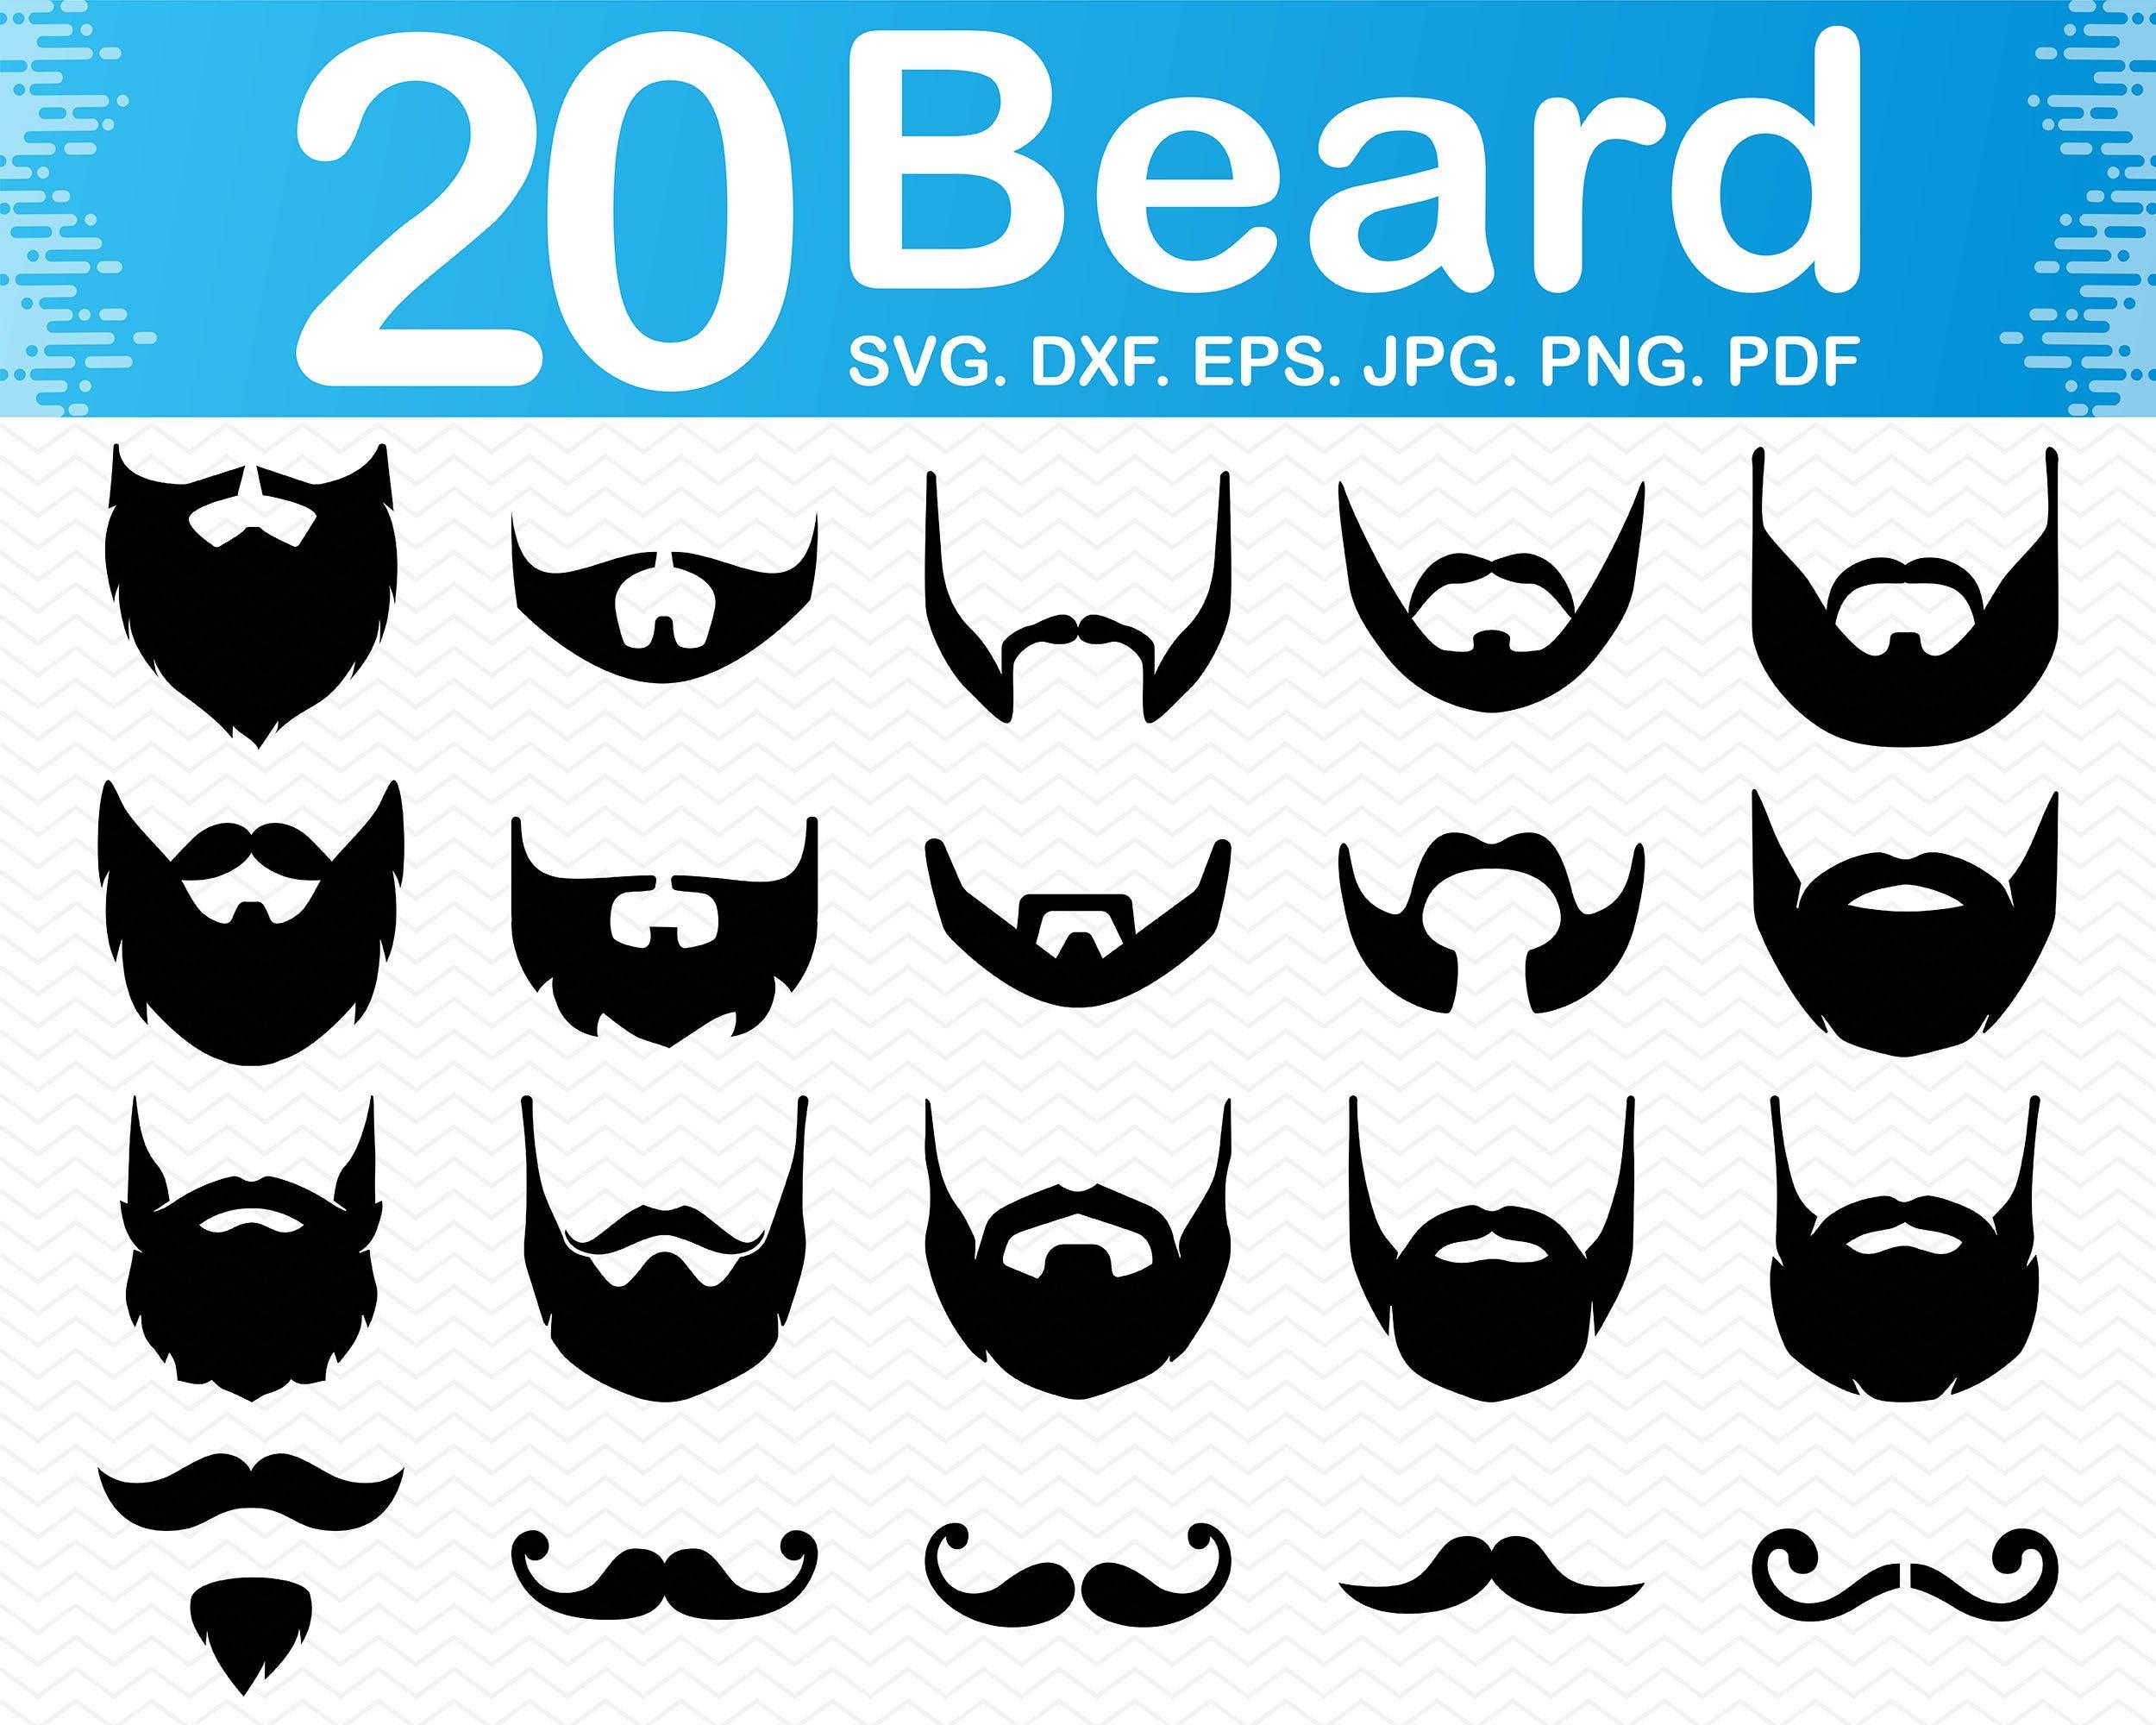 Beard svg Mustache svg Bearded man svg files for cricut